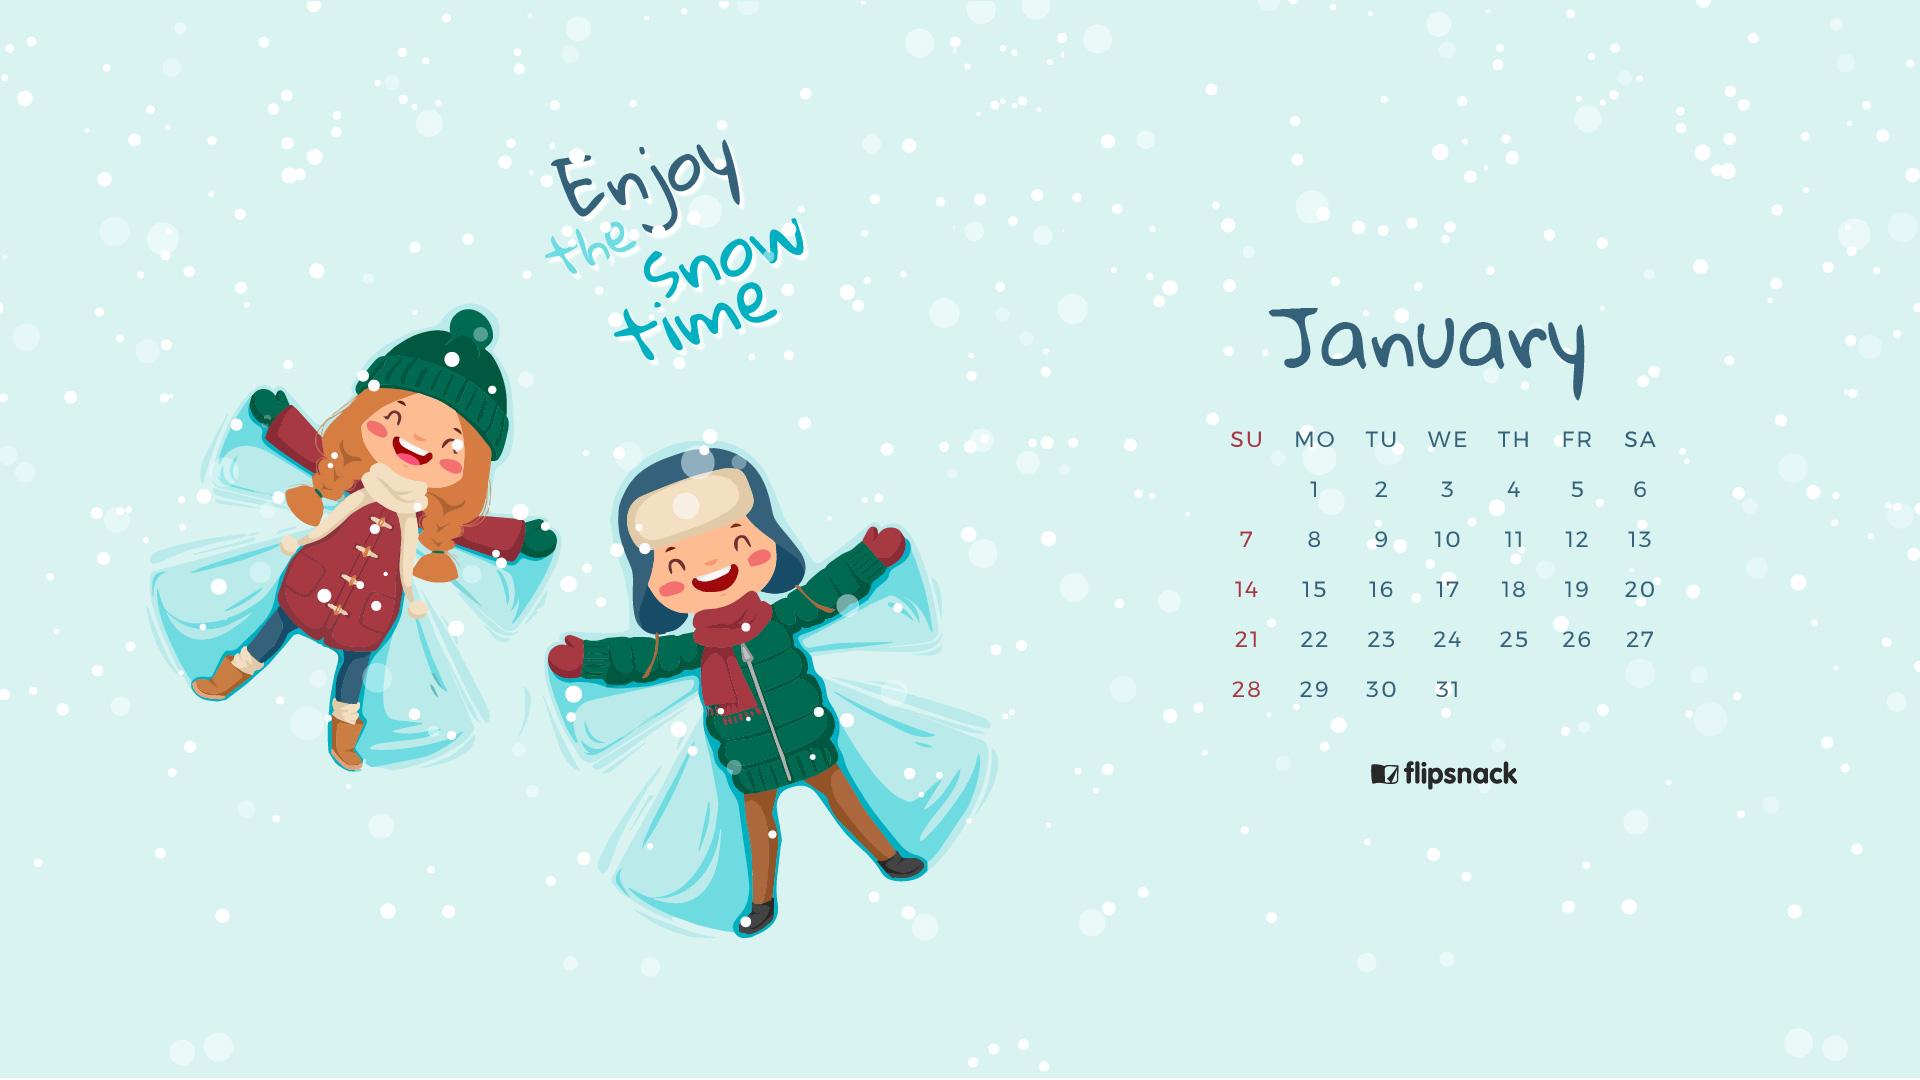 Desktop Calendar January 2018 : January calendar wallpaper for desktop background